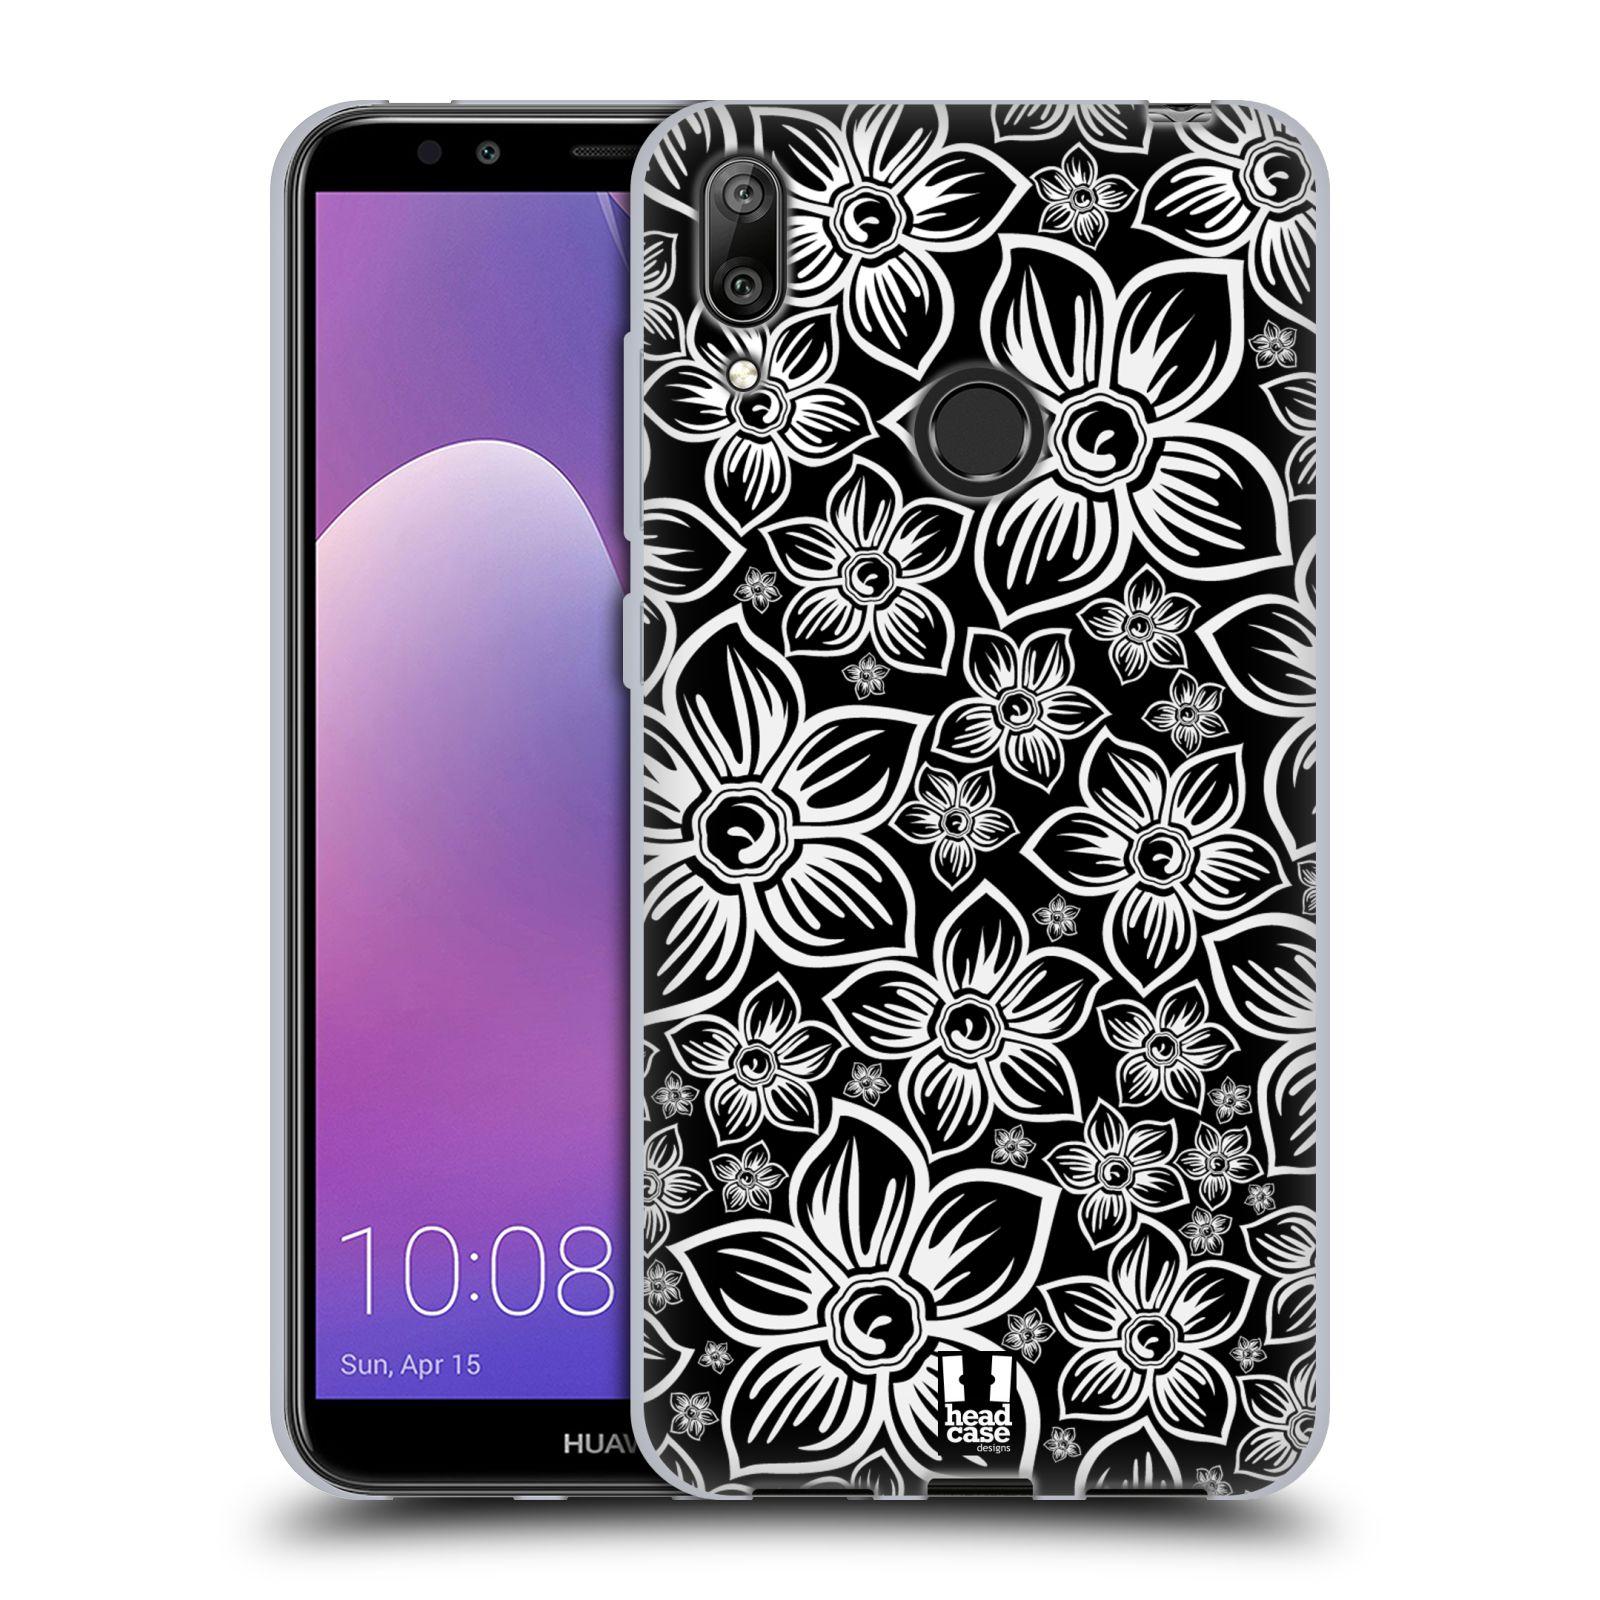 Silikonové pouzdro na mobil Huawei Y7 (2019) - Head Case - FLORAL DAISY